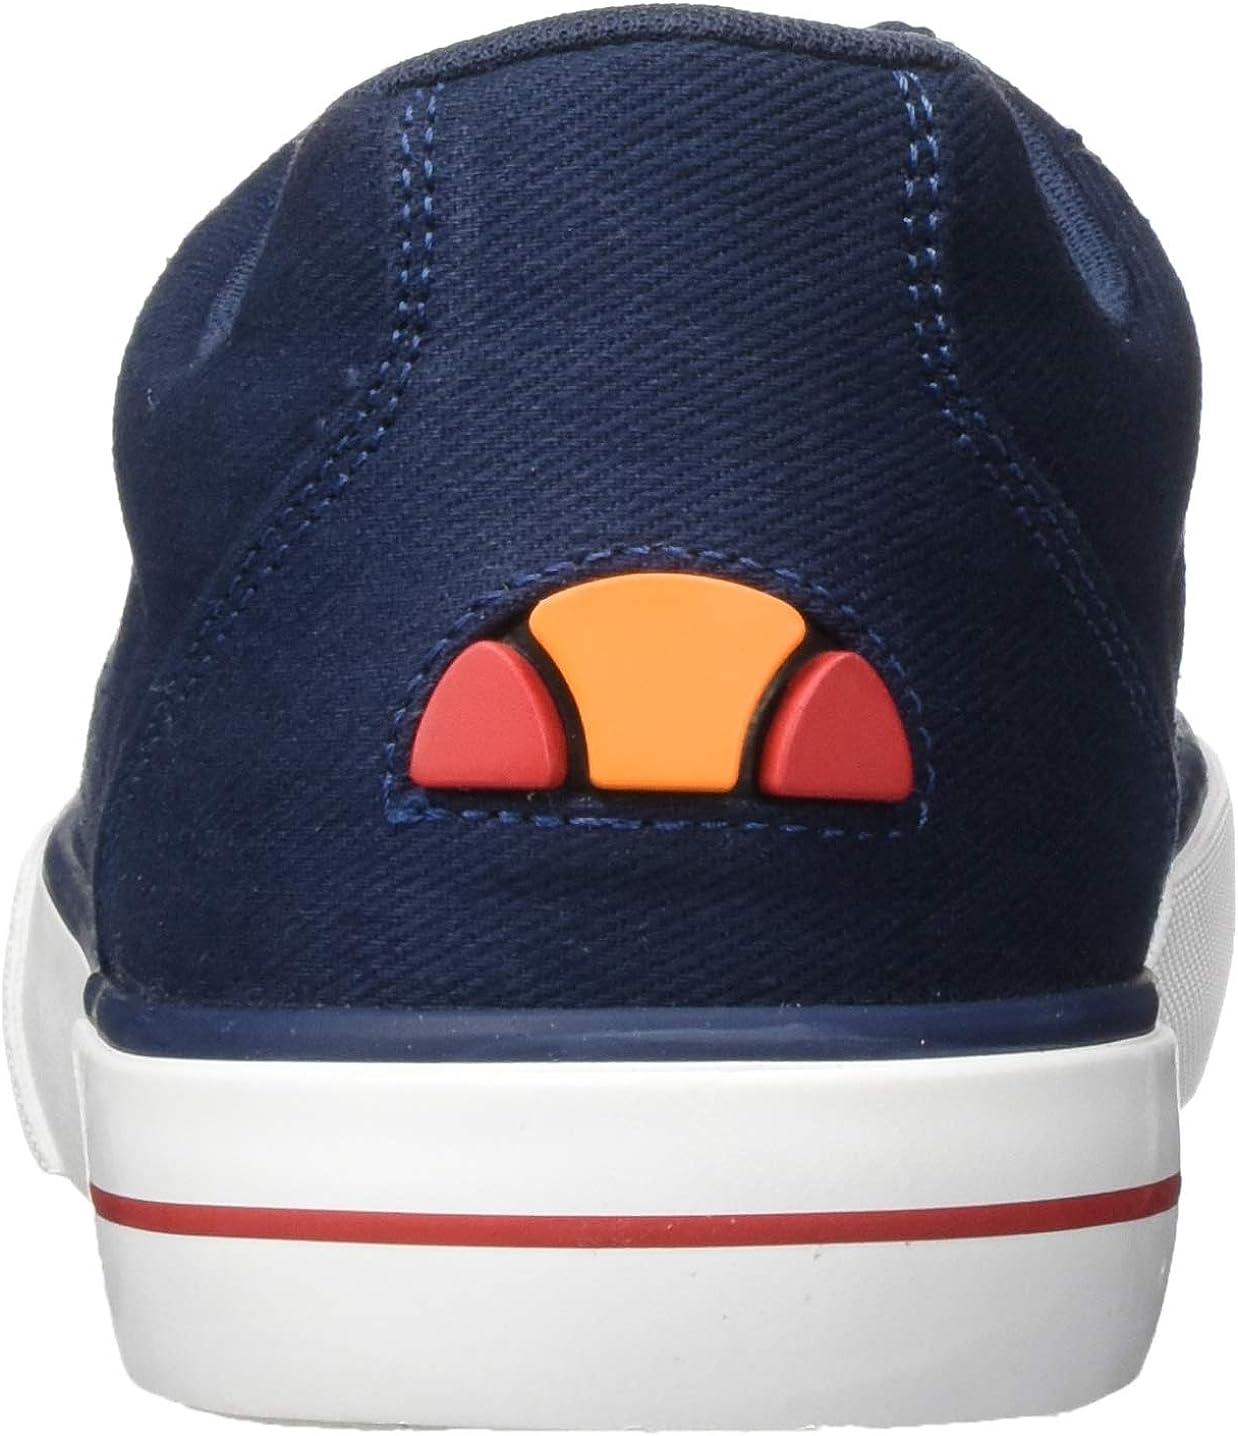 Ellesse Taggia, Baskets Homme Multicolore Dark Blue Red White Dk Blu Red Wht